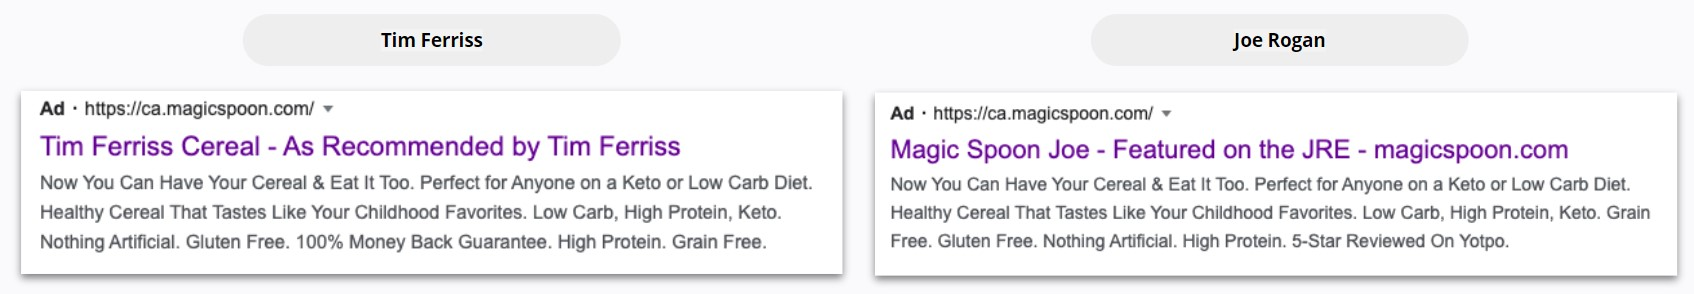 Magic Spoon - Search Ads